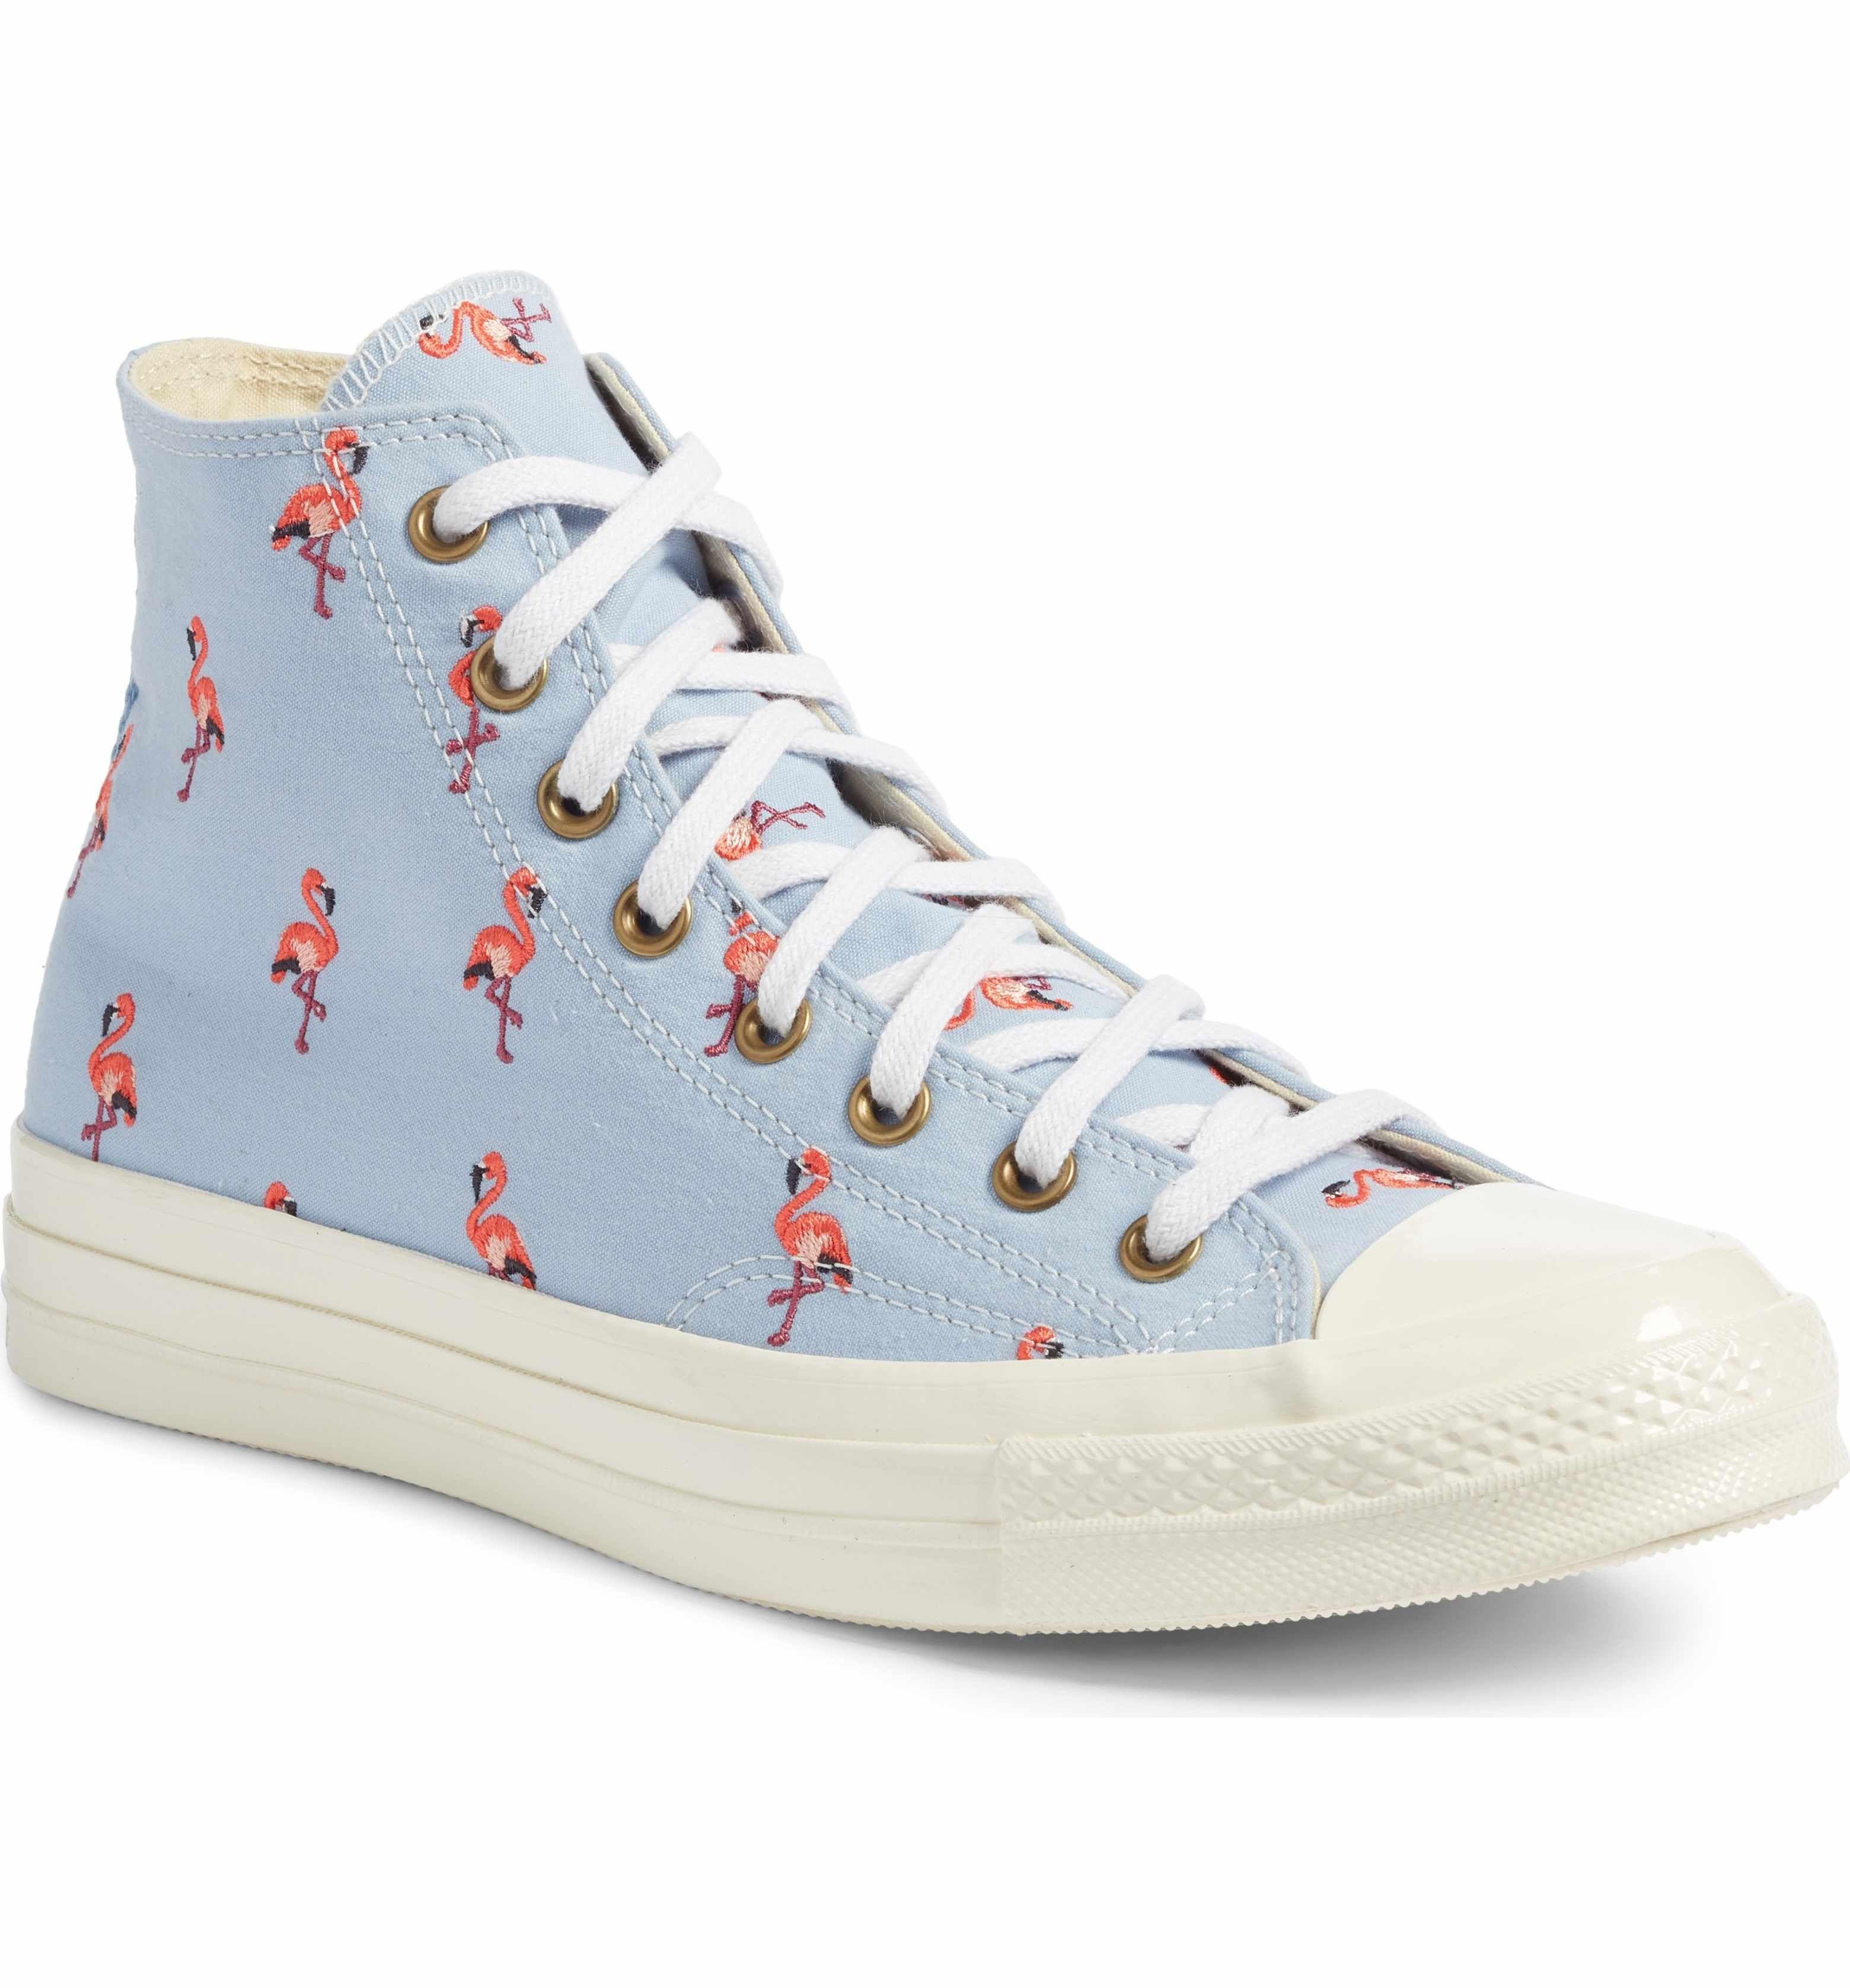 08f4531bd3c Converse Chuck Taylor® All Star® Chuck 70 Flamingo Sneaker (Men)  Nordstrom